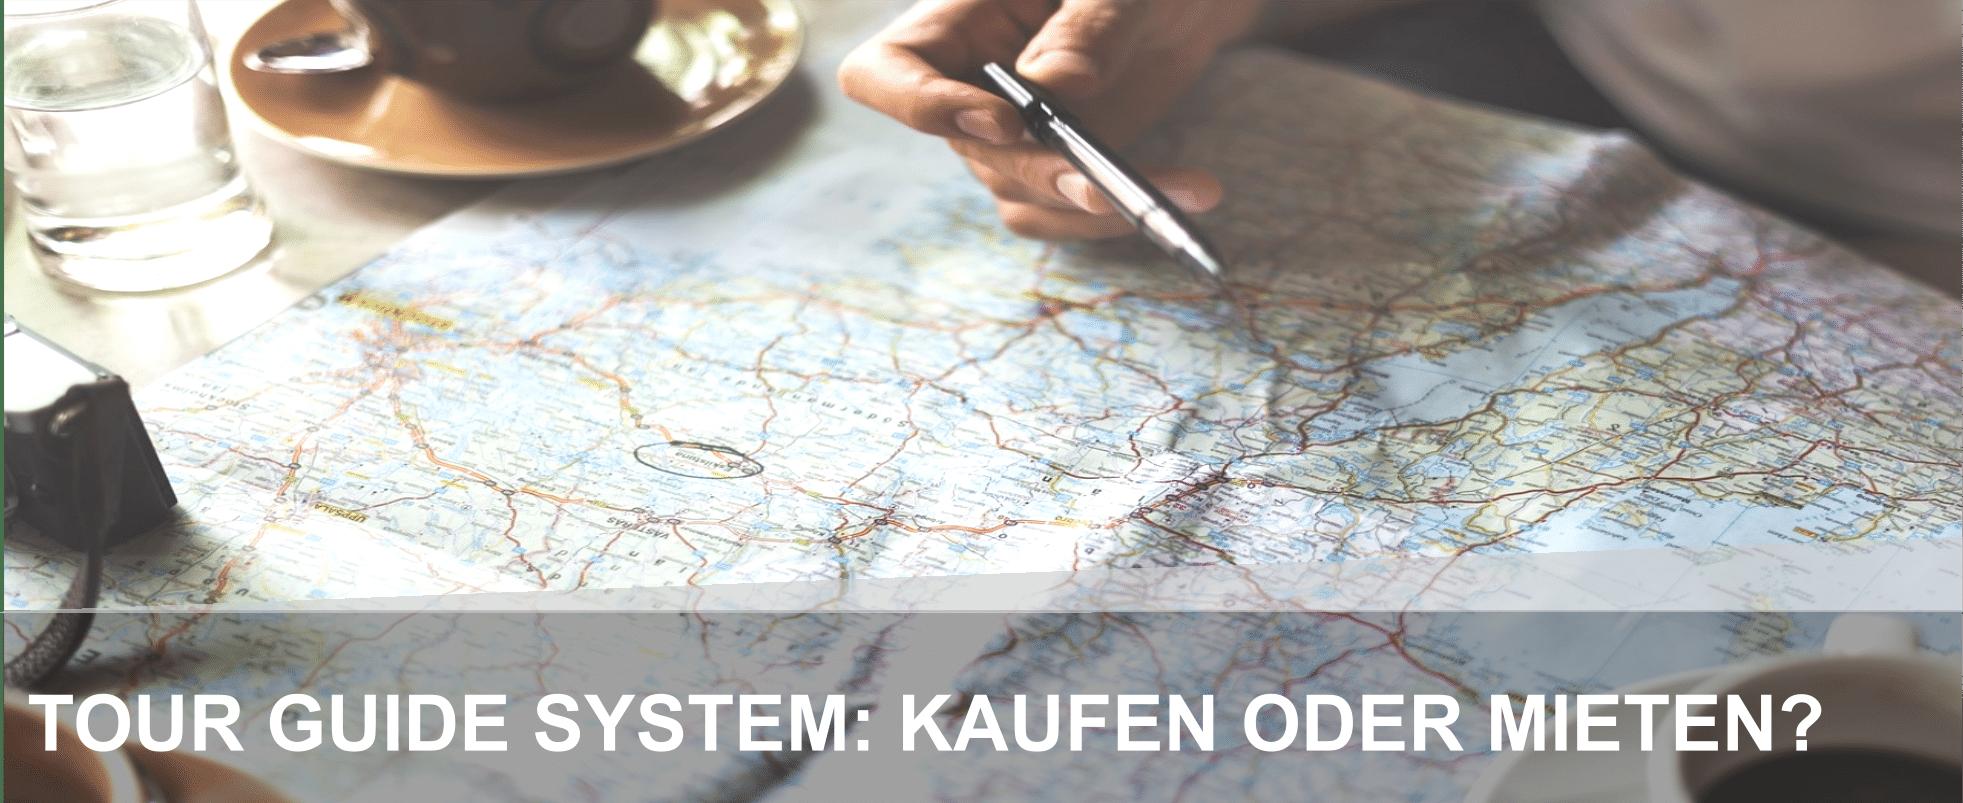 Tour Guide System kaufen oder mieten